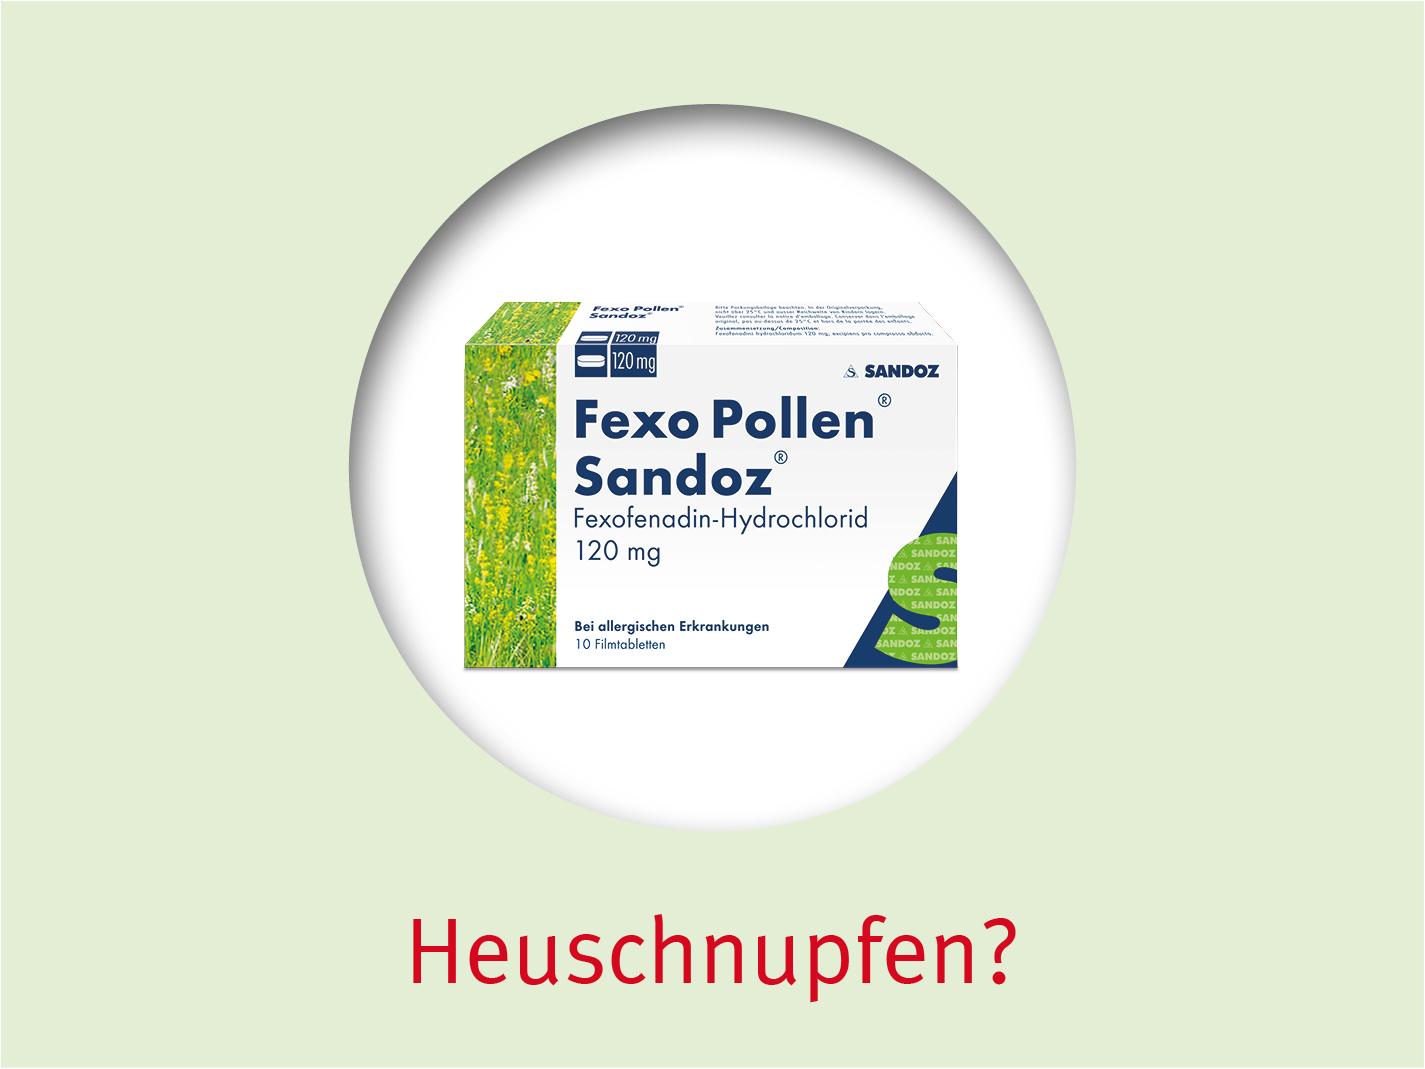 fexo_pollen_teaserbox.jpg